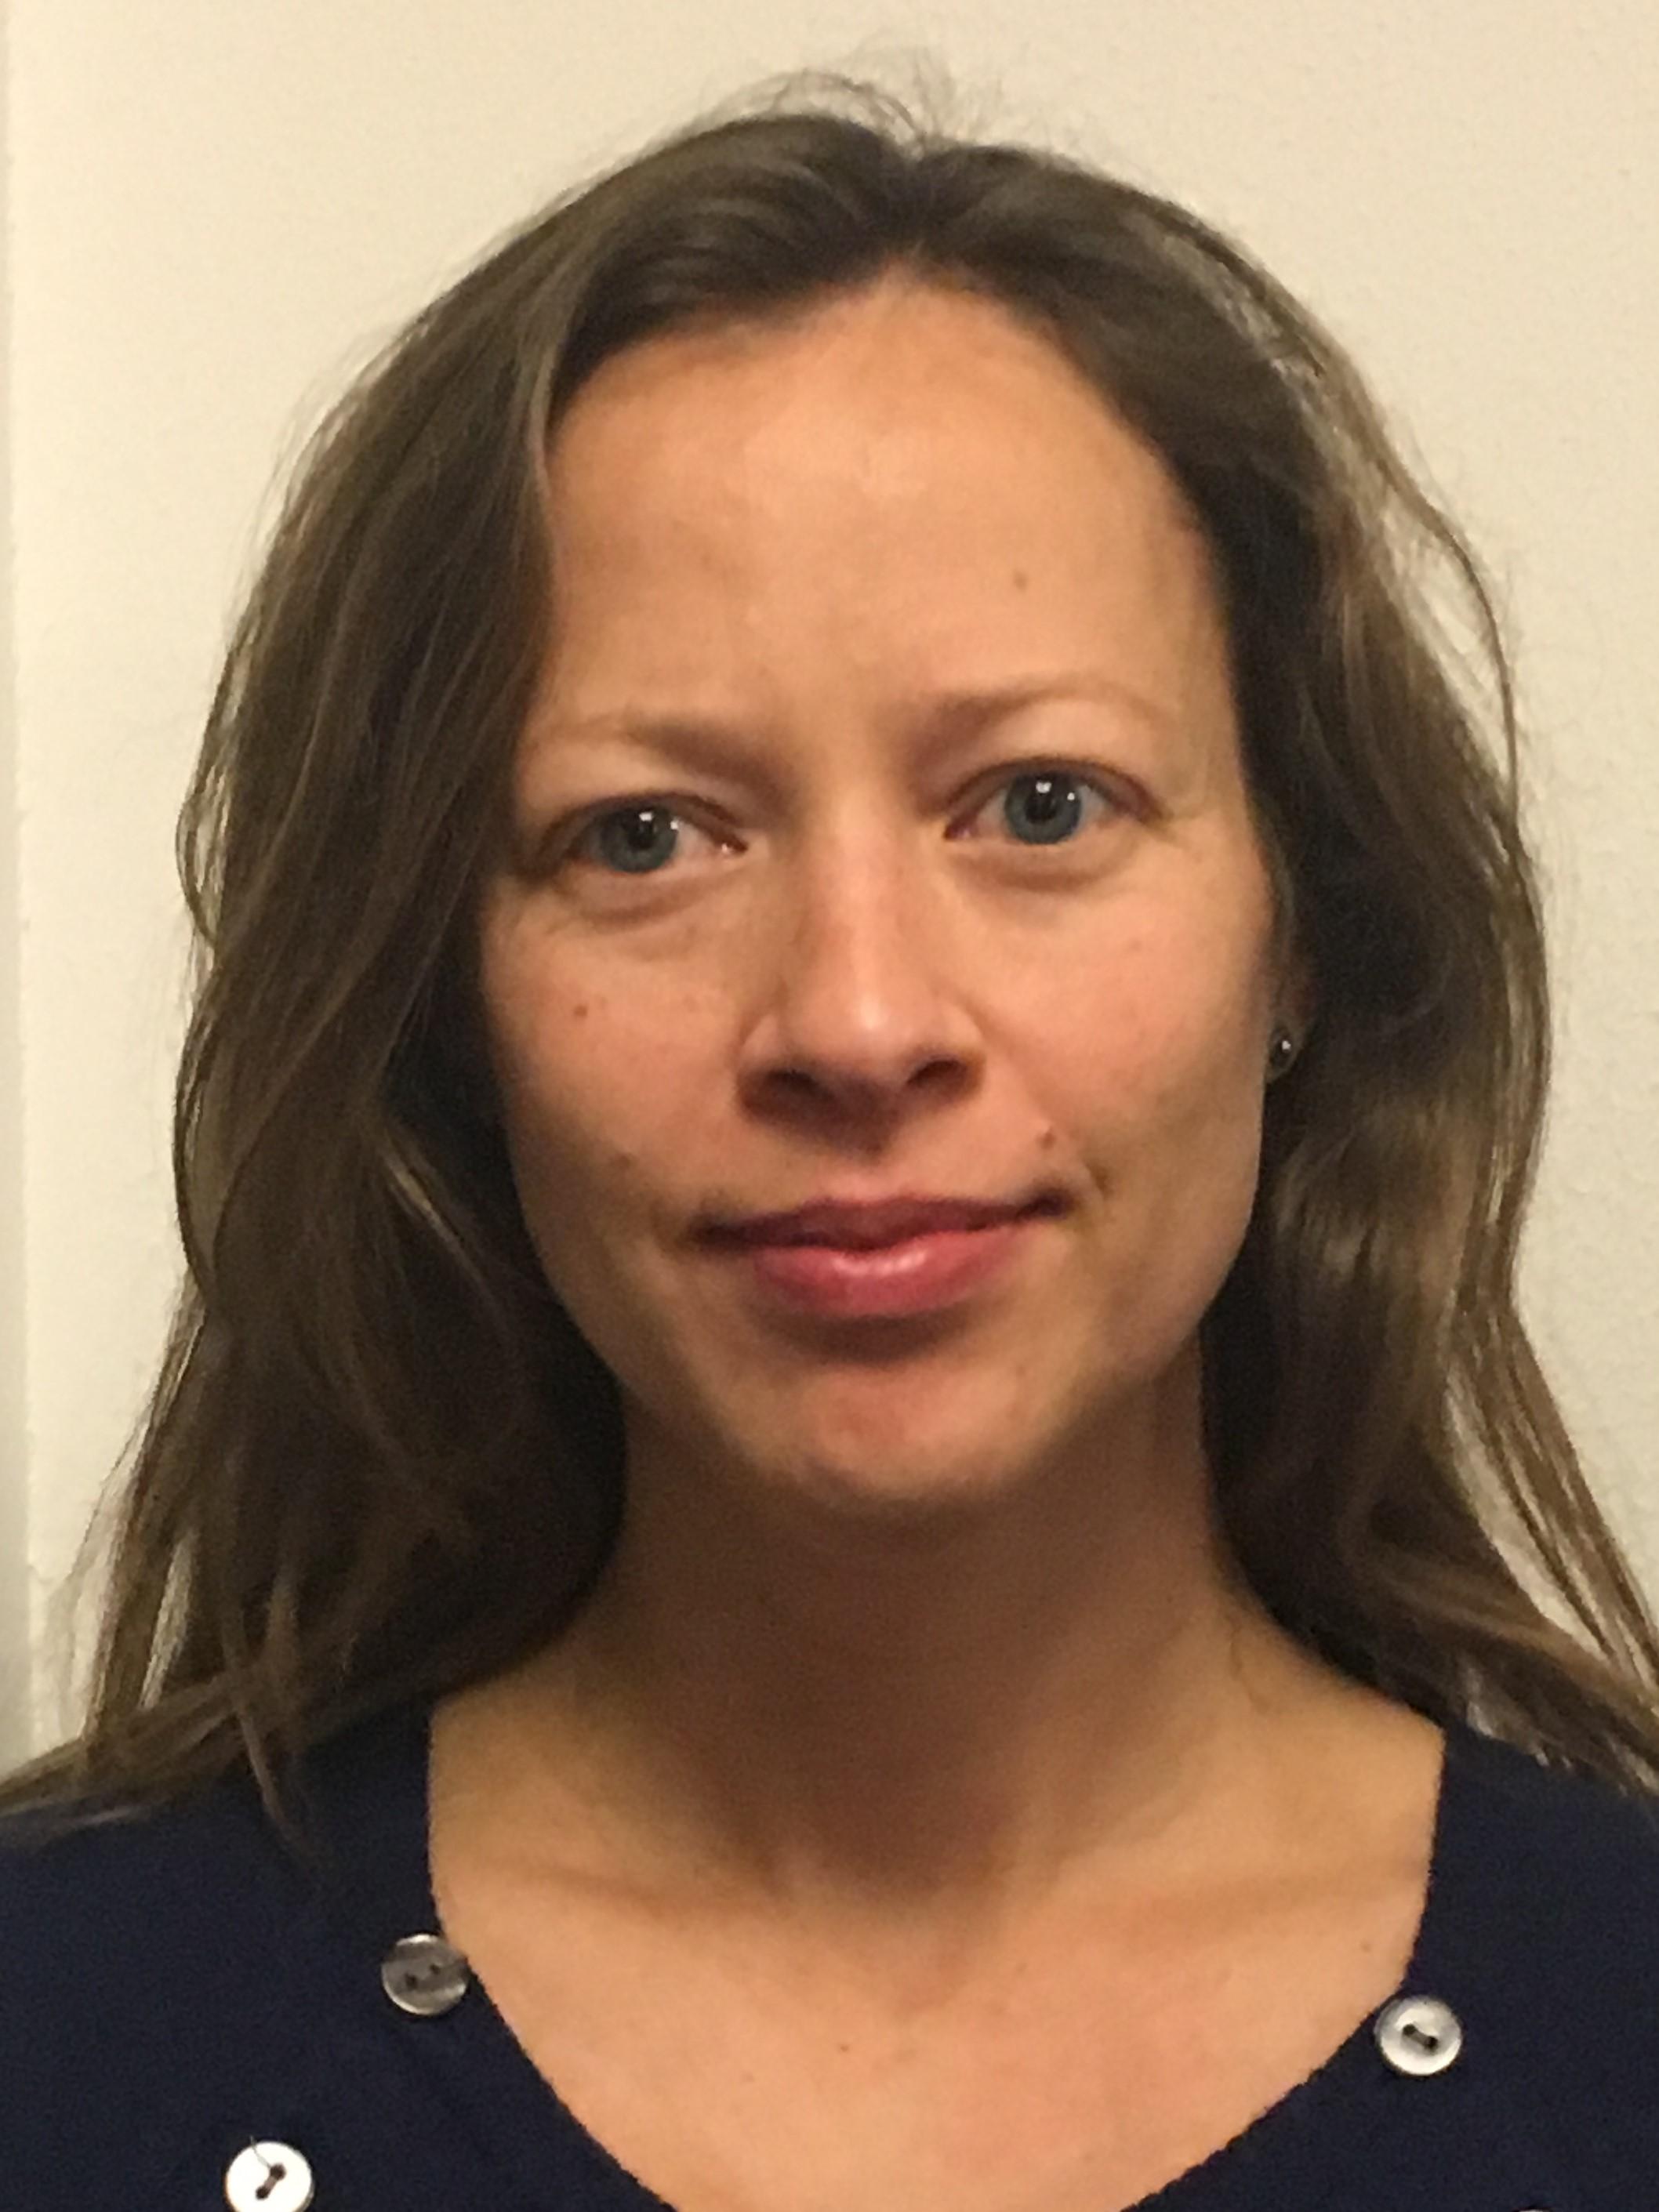 Susanne Irvang